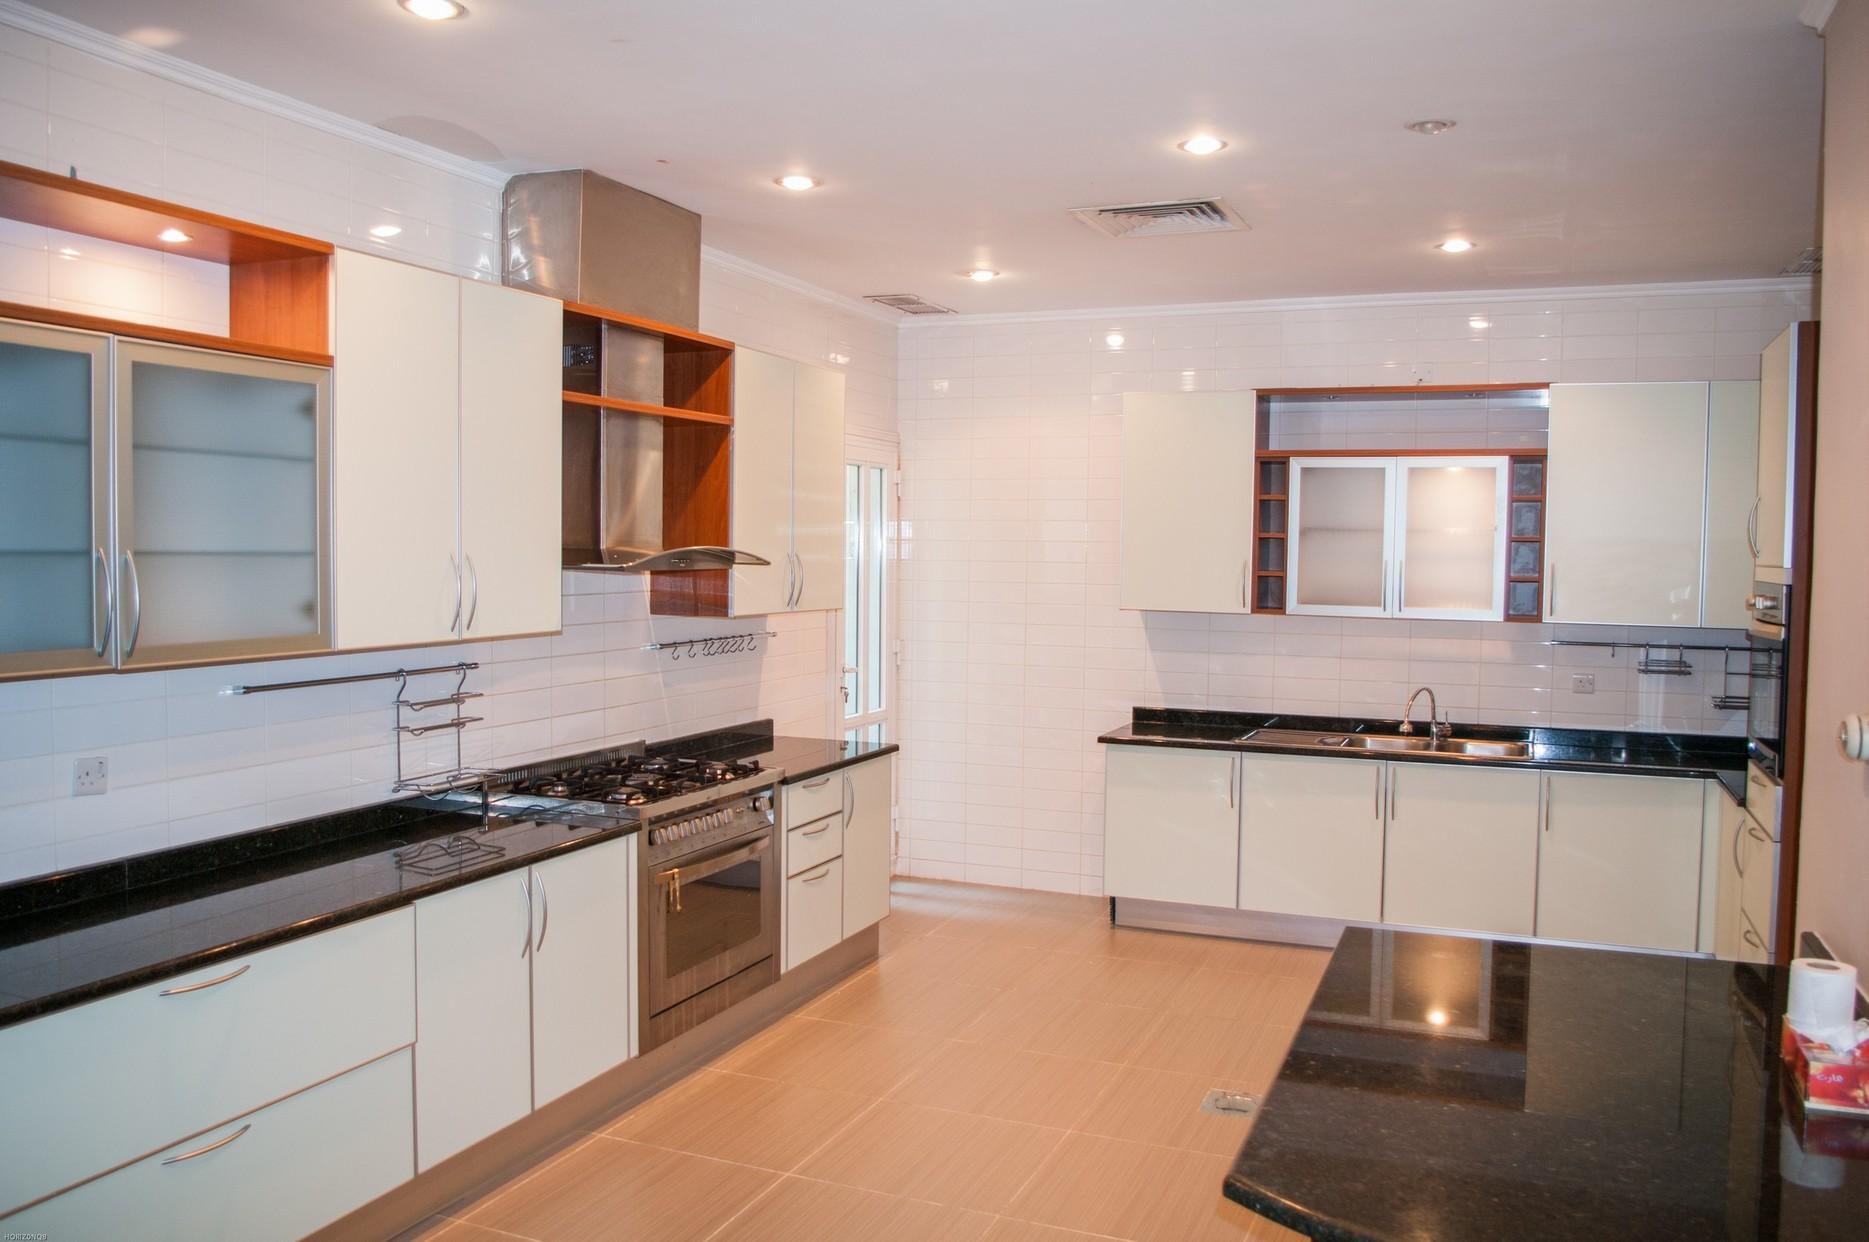 Rumathiya – spacious, unfurnished, four bedroom ground floor